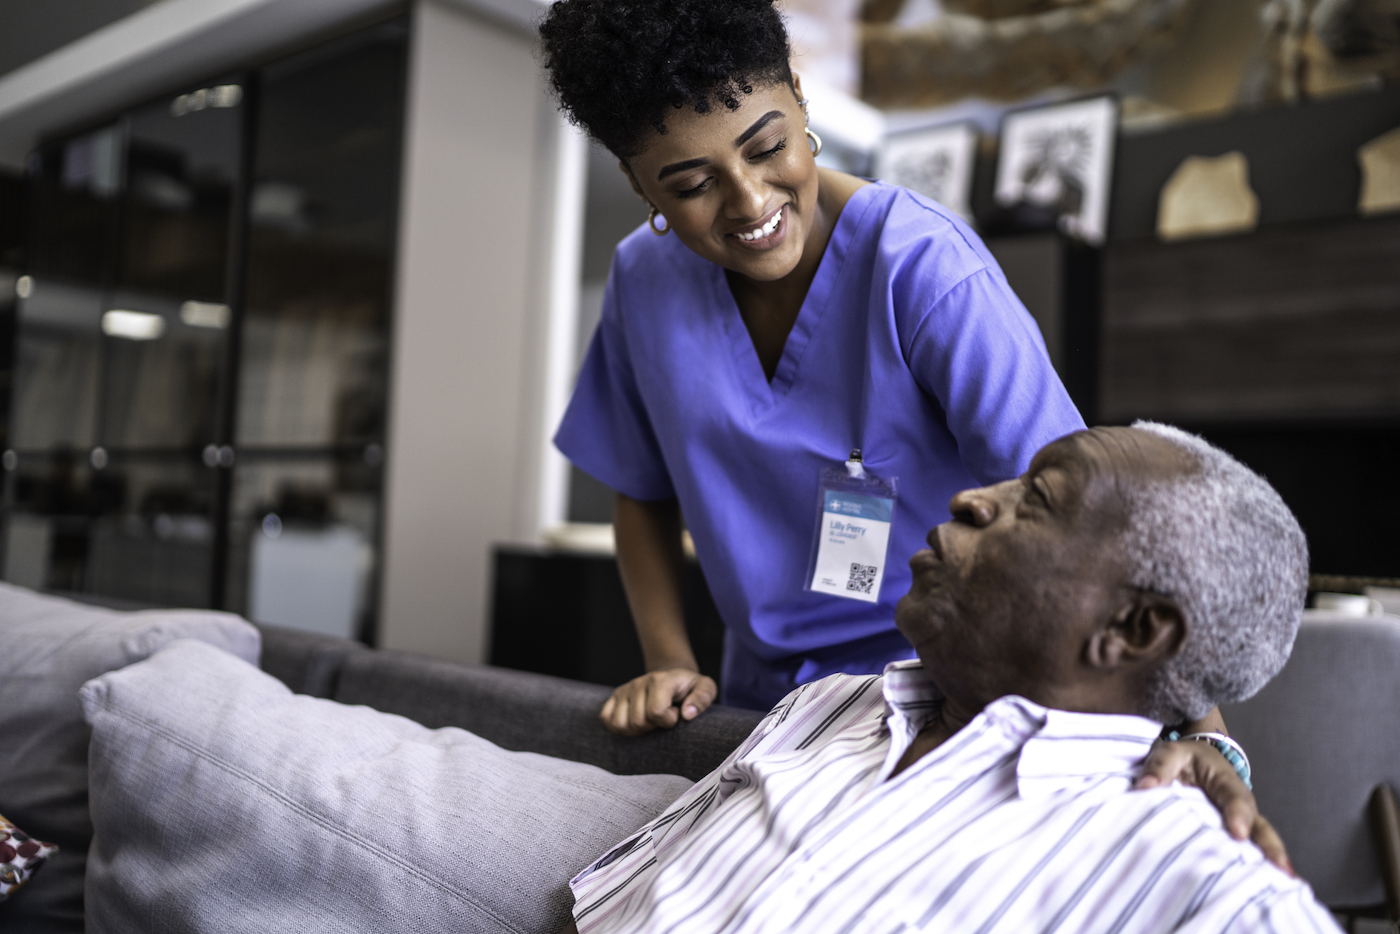 Female nurse taking care of a senior man at home